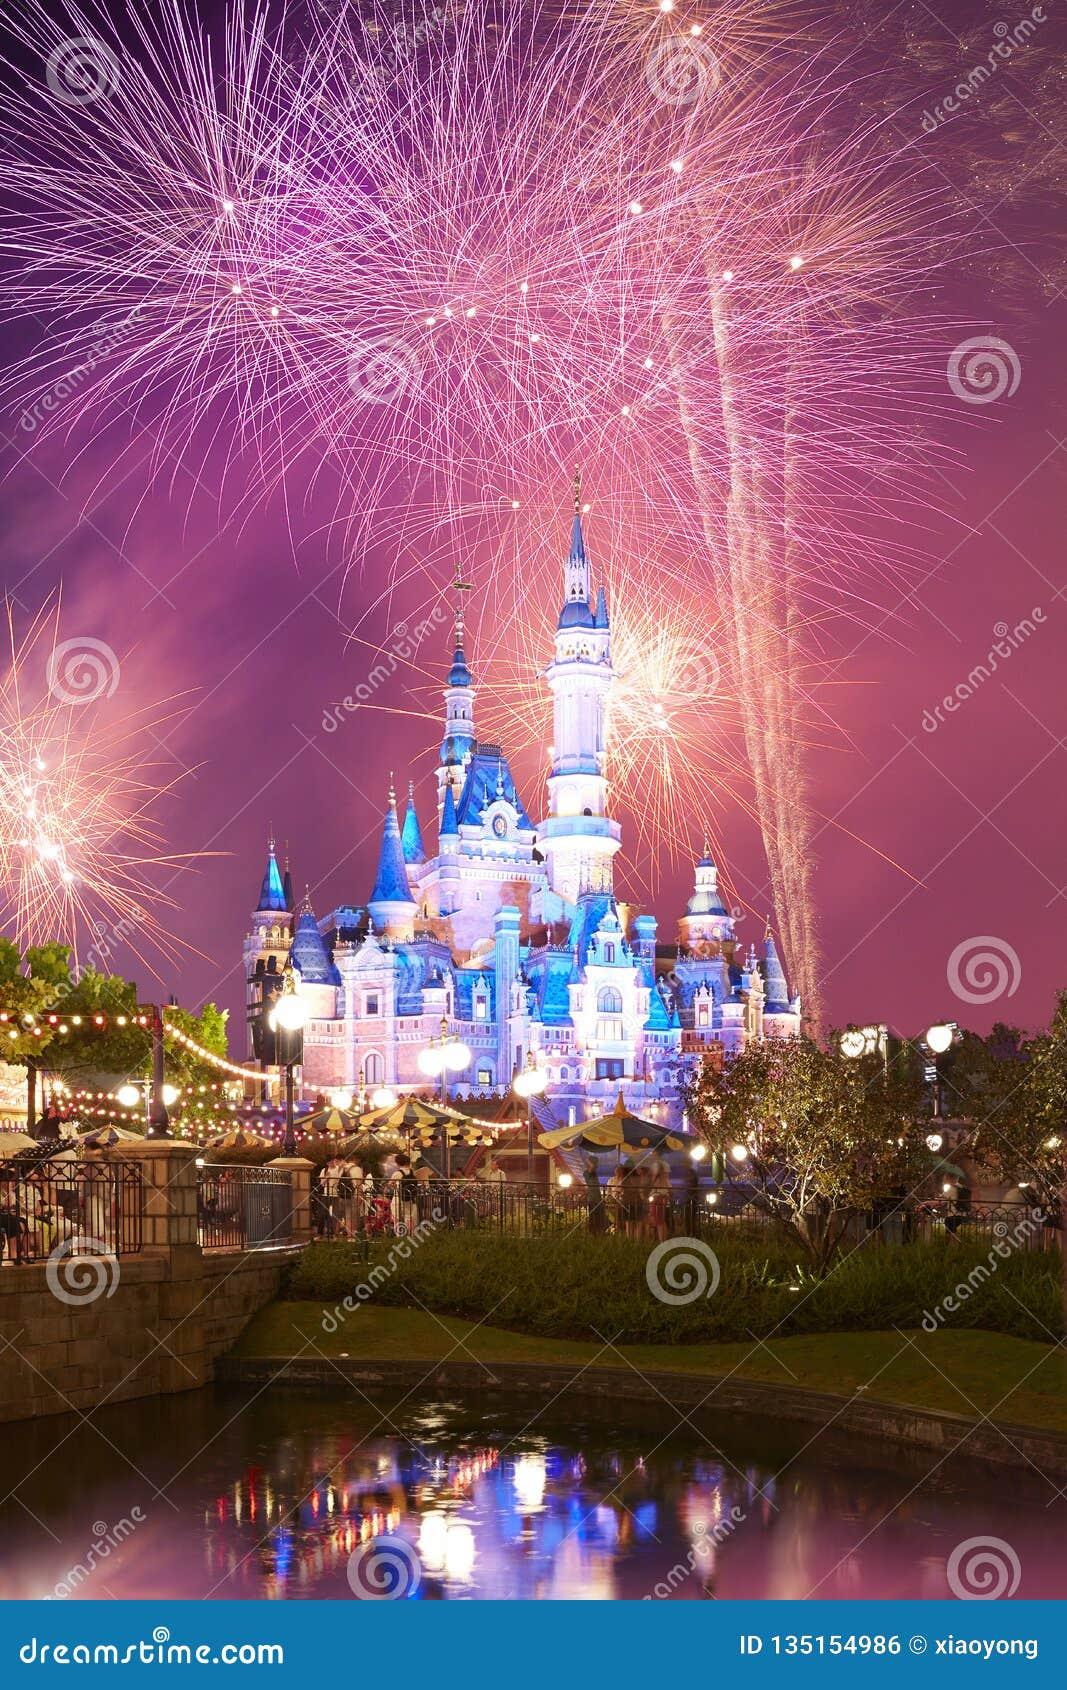 Shanghai Disney castle and fireworks